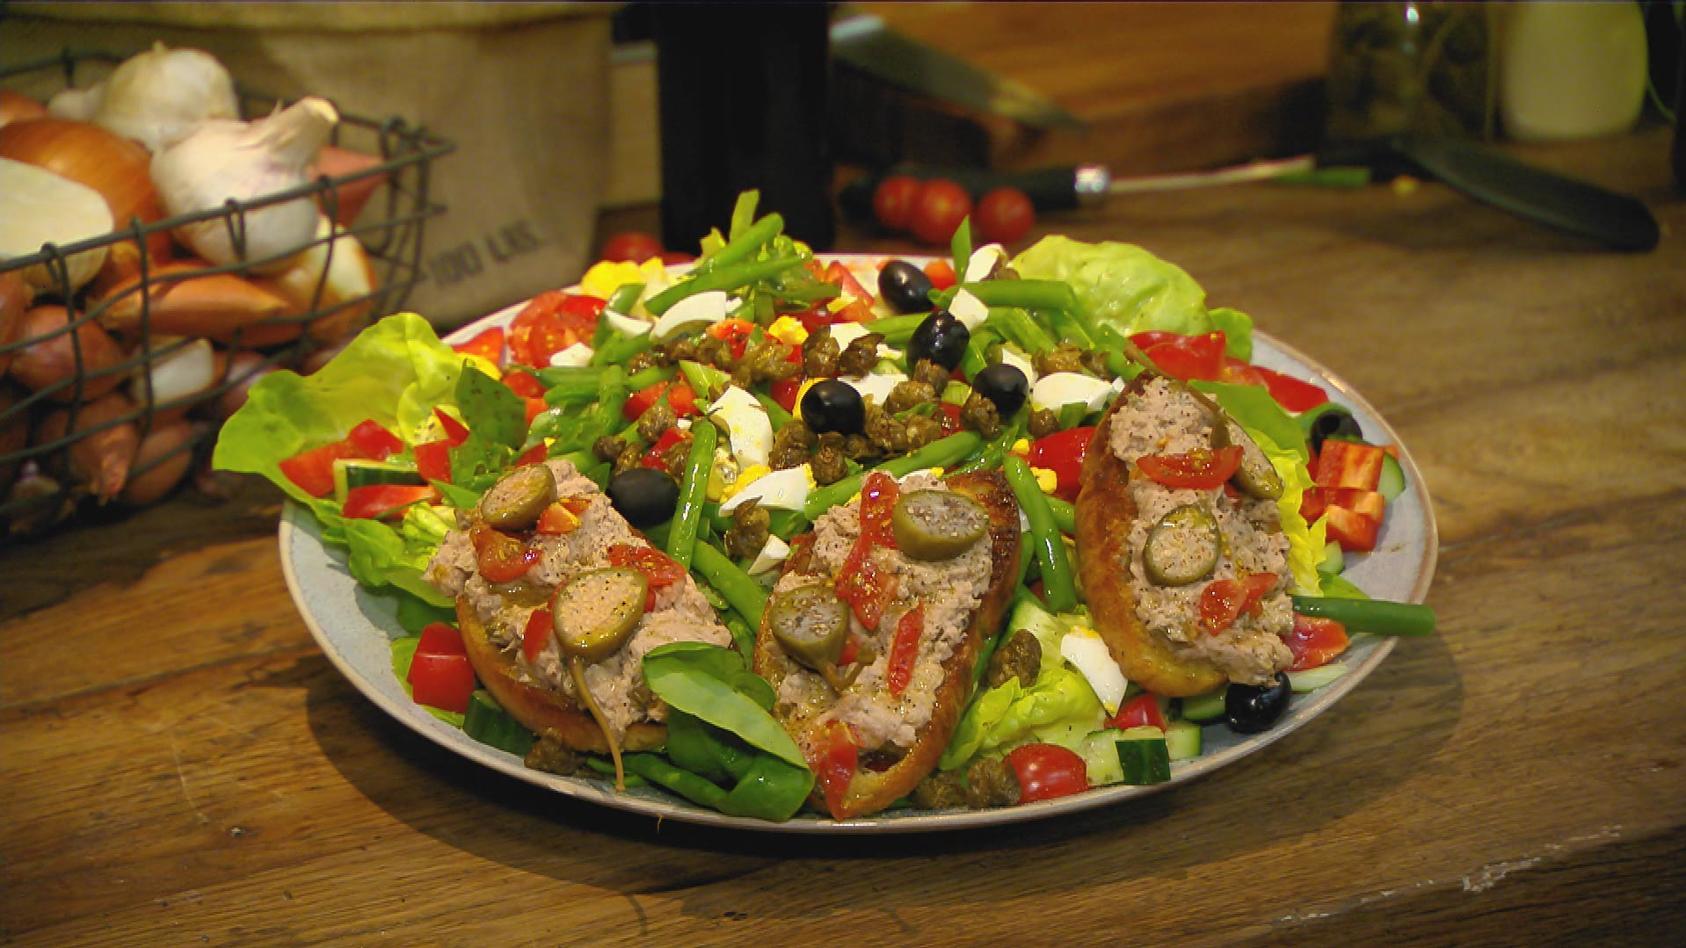 Überraschung! – Spontan kreative Gerichte zaubern:   Nizza-Salat mit Thunfischcreme-Crostini